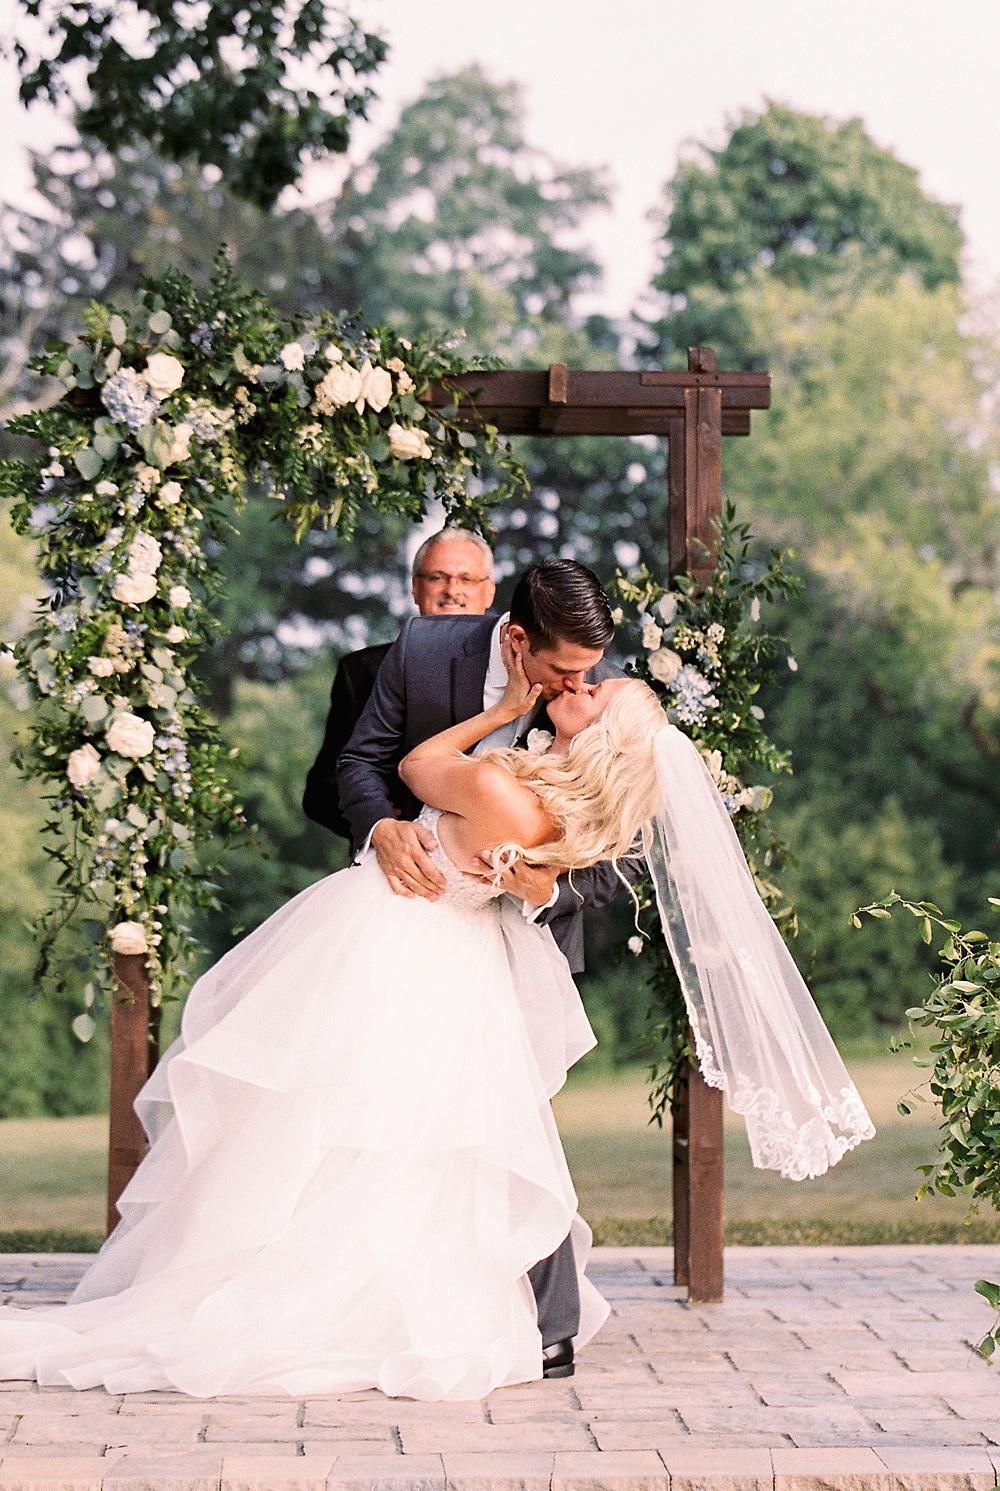 kristin-la-voie-photography-lehmann-mansion-wedding-photographer-31